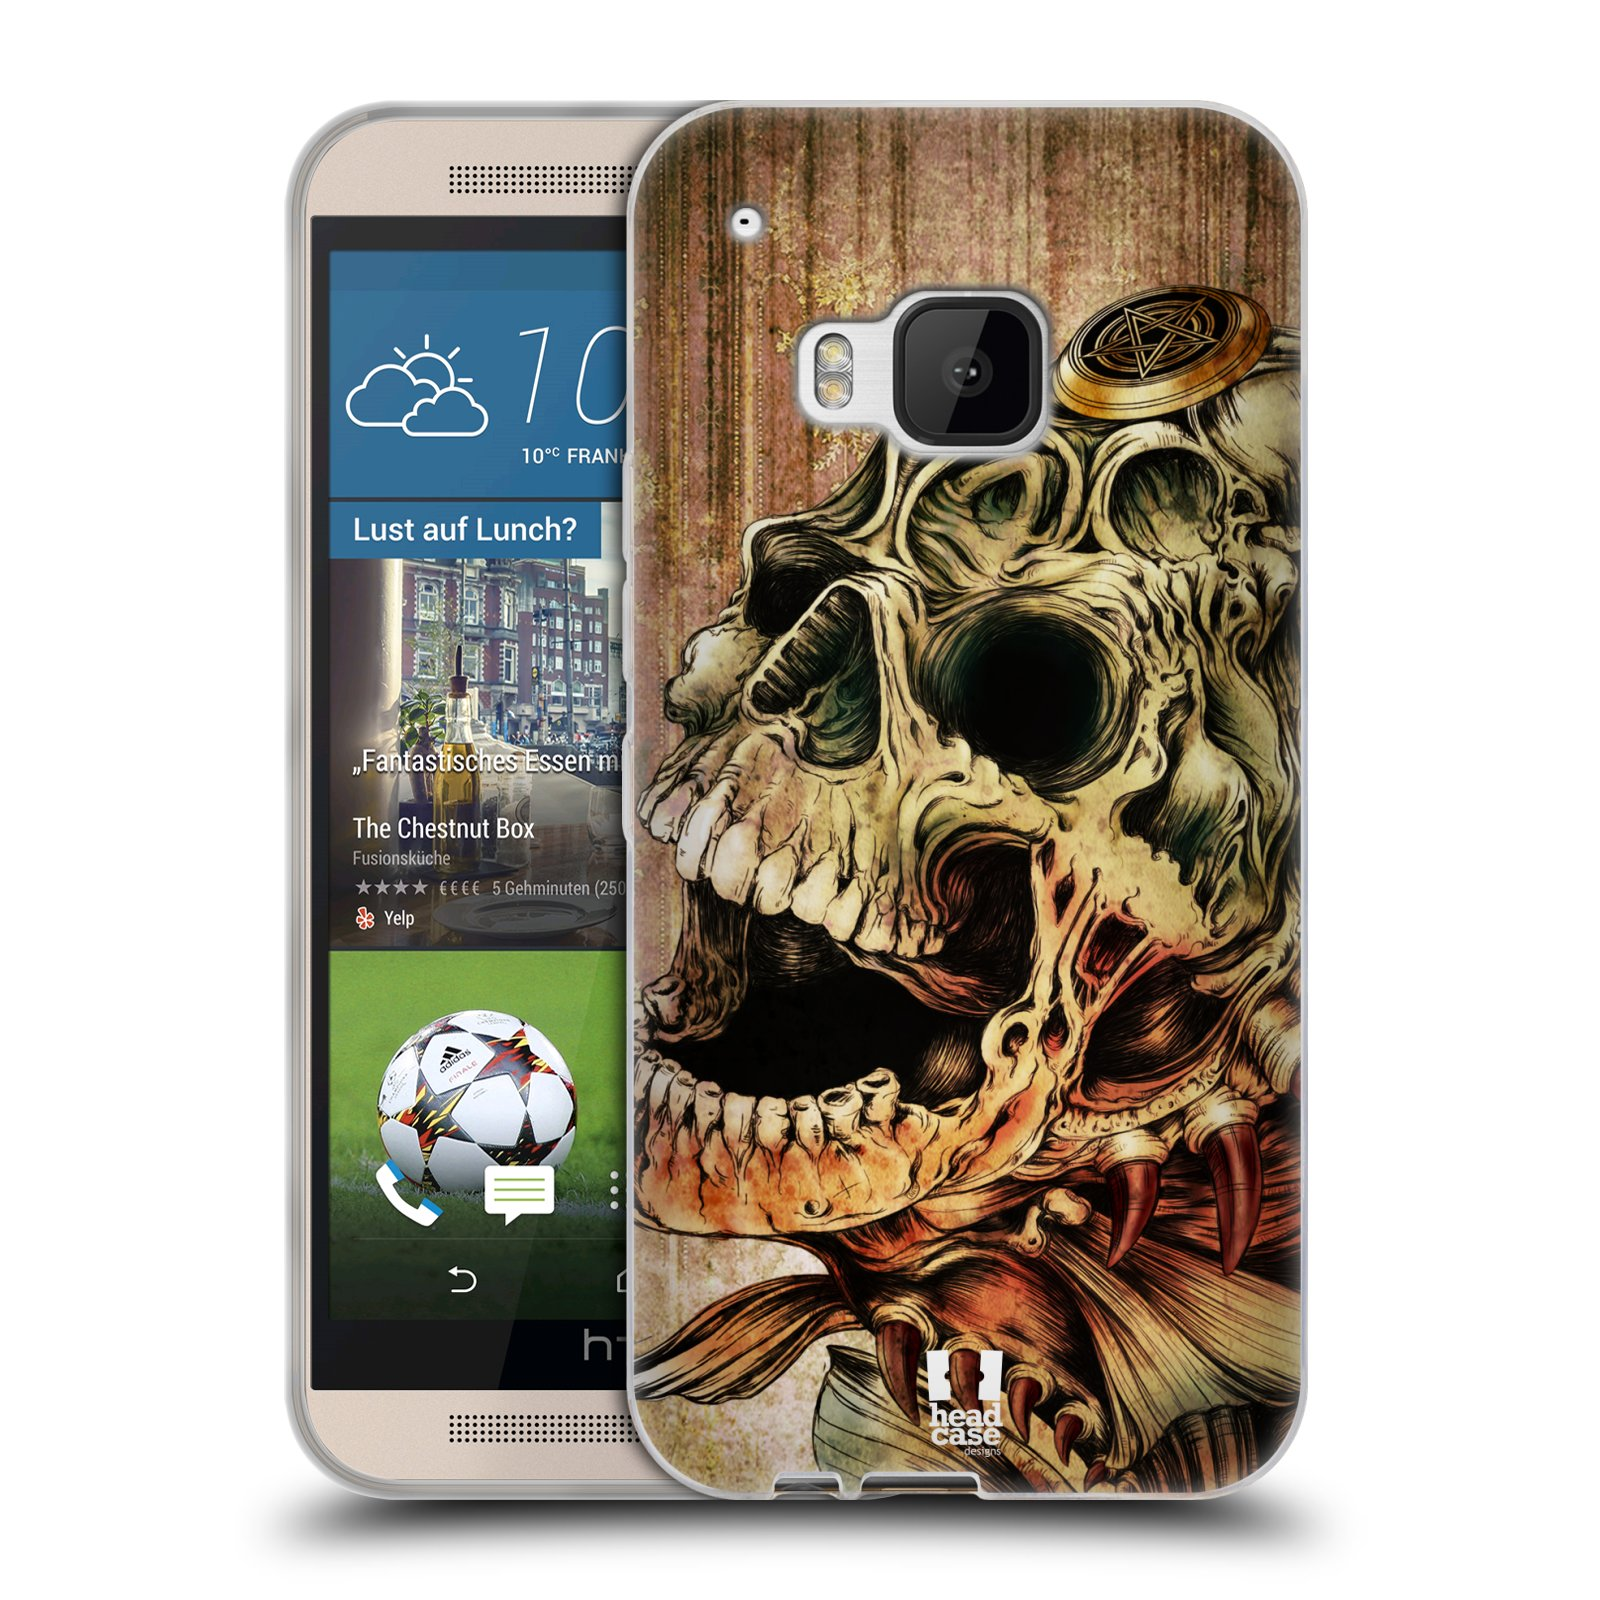 Silikonové pouzdro na mobil HTC ONE M9 HEAD CASE PIRANHA (Silikonový kryt či obal na mobilní telefon HTC ONE M9)